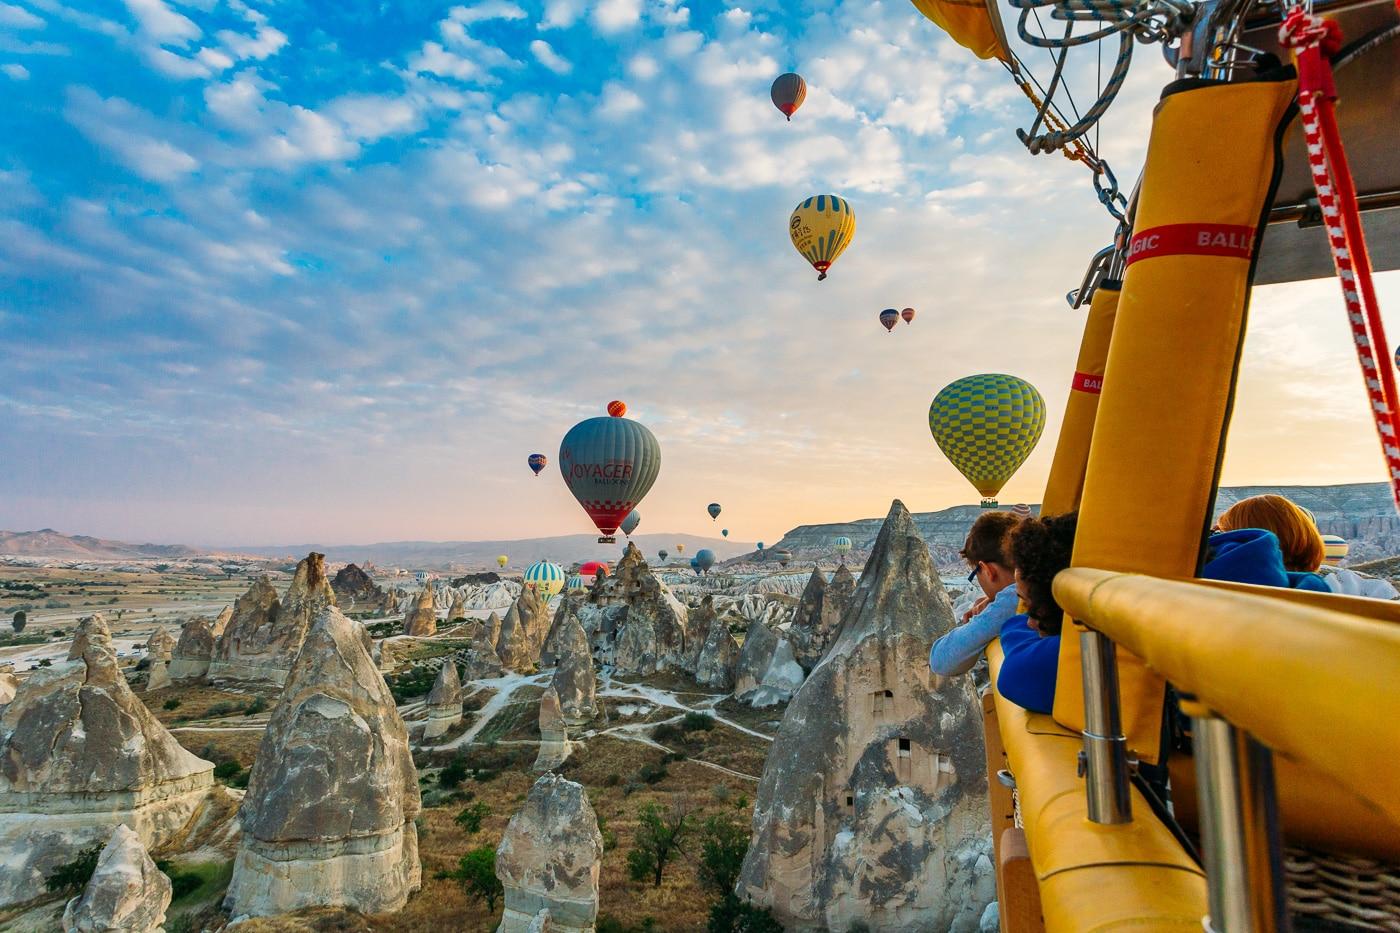 Tho-nhi-ky-tour-8-ngay-8-dem-balloon